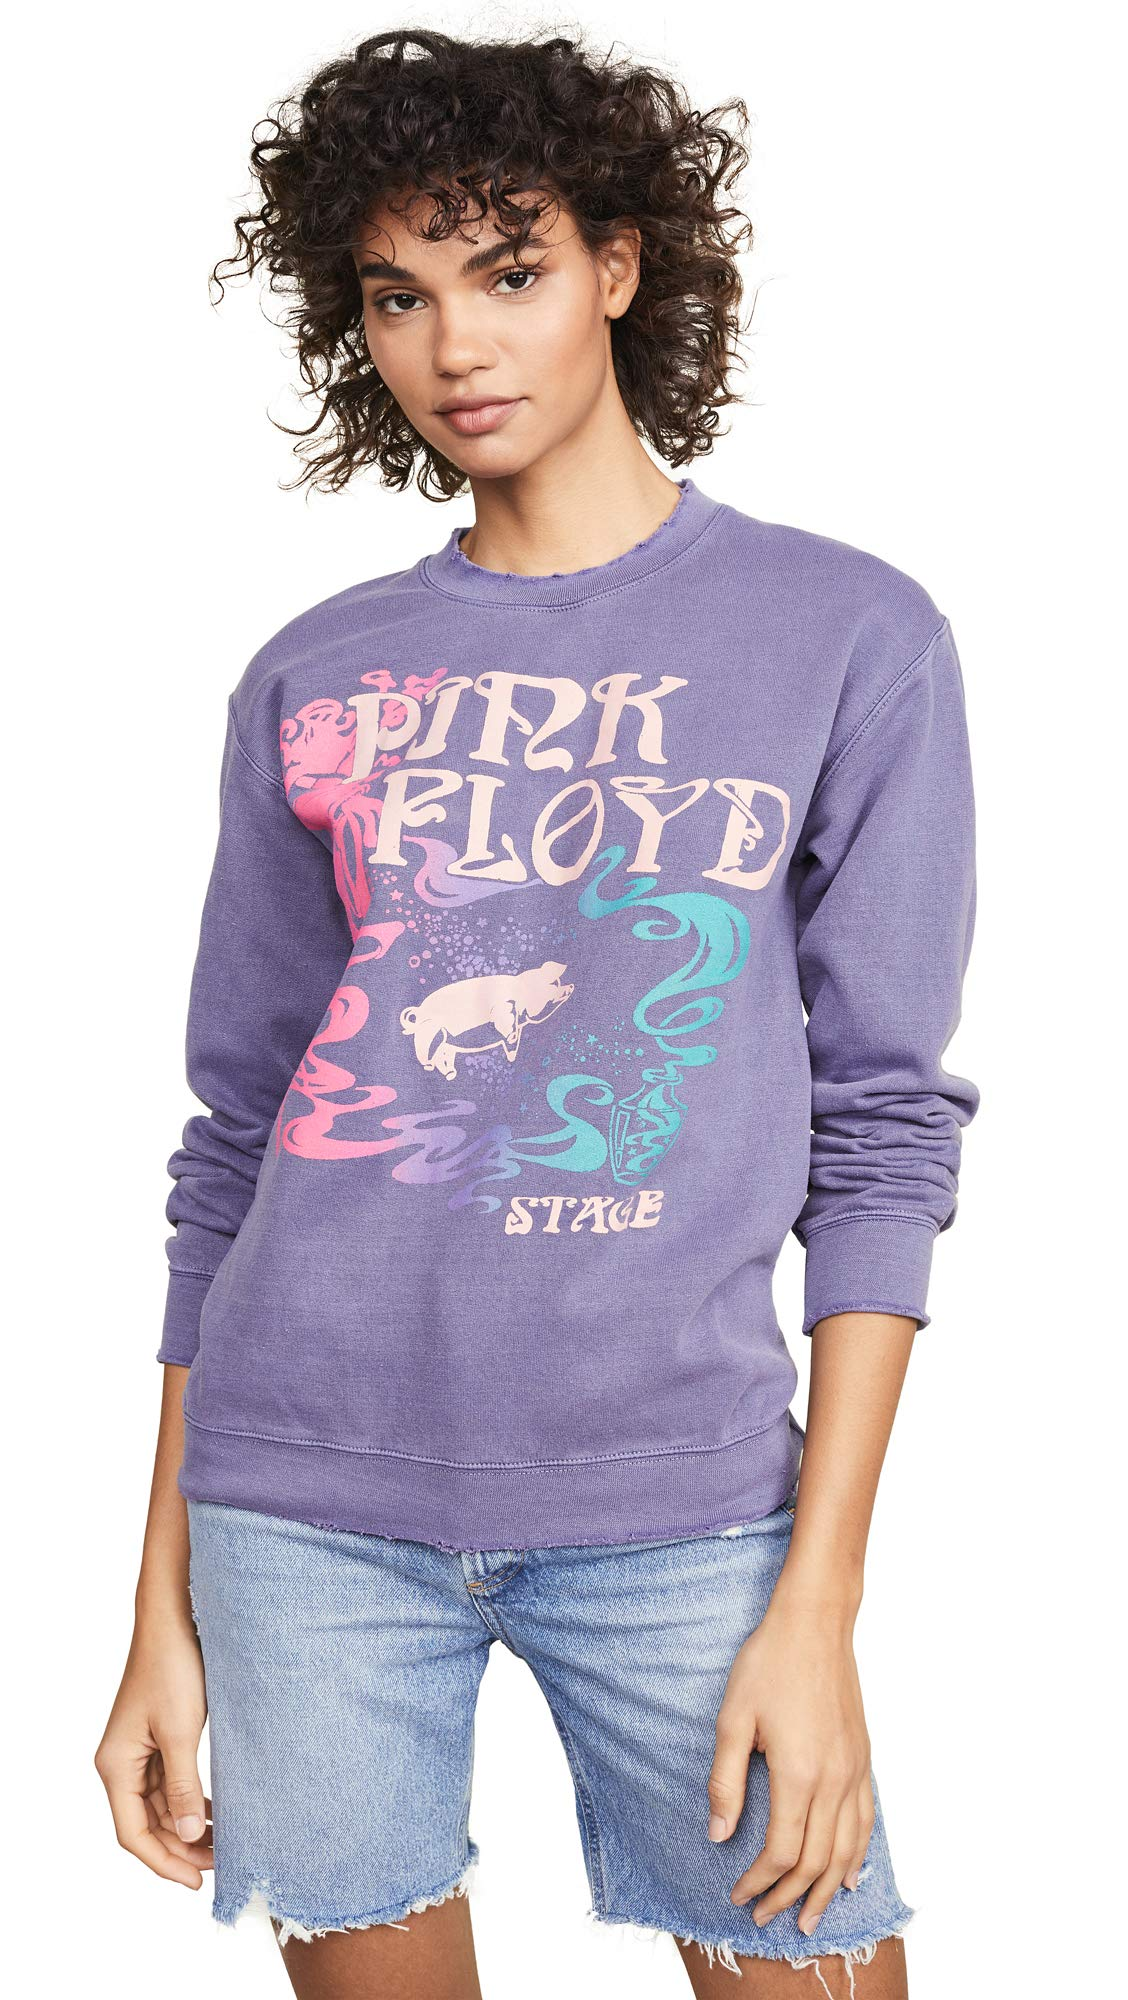 MADEWORN ROCK Women's Pink Floyd Tampa Sweatshirt, Navy, Small